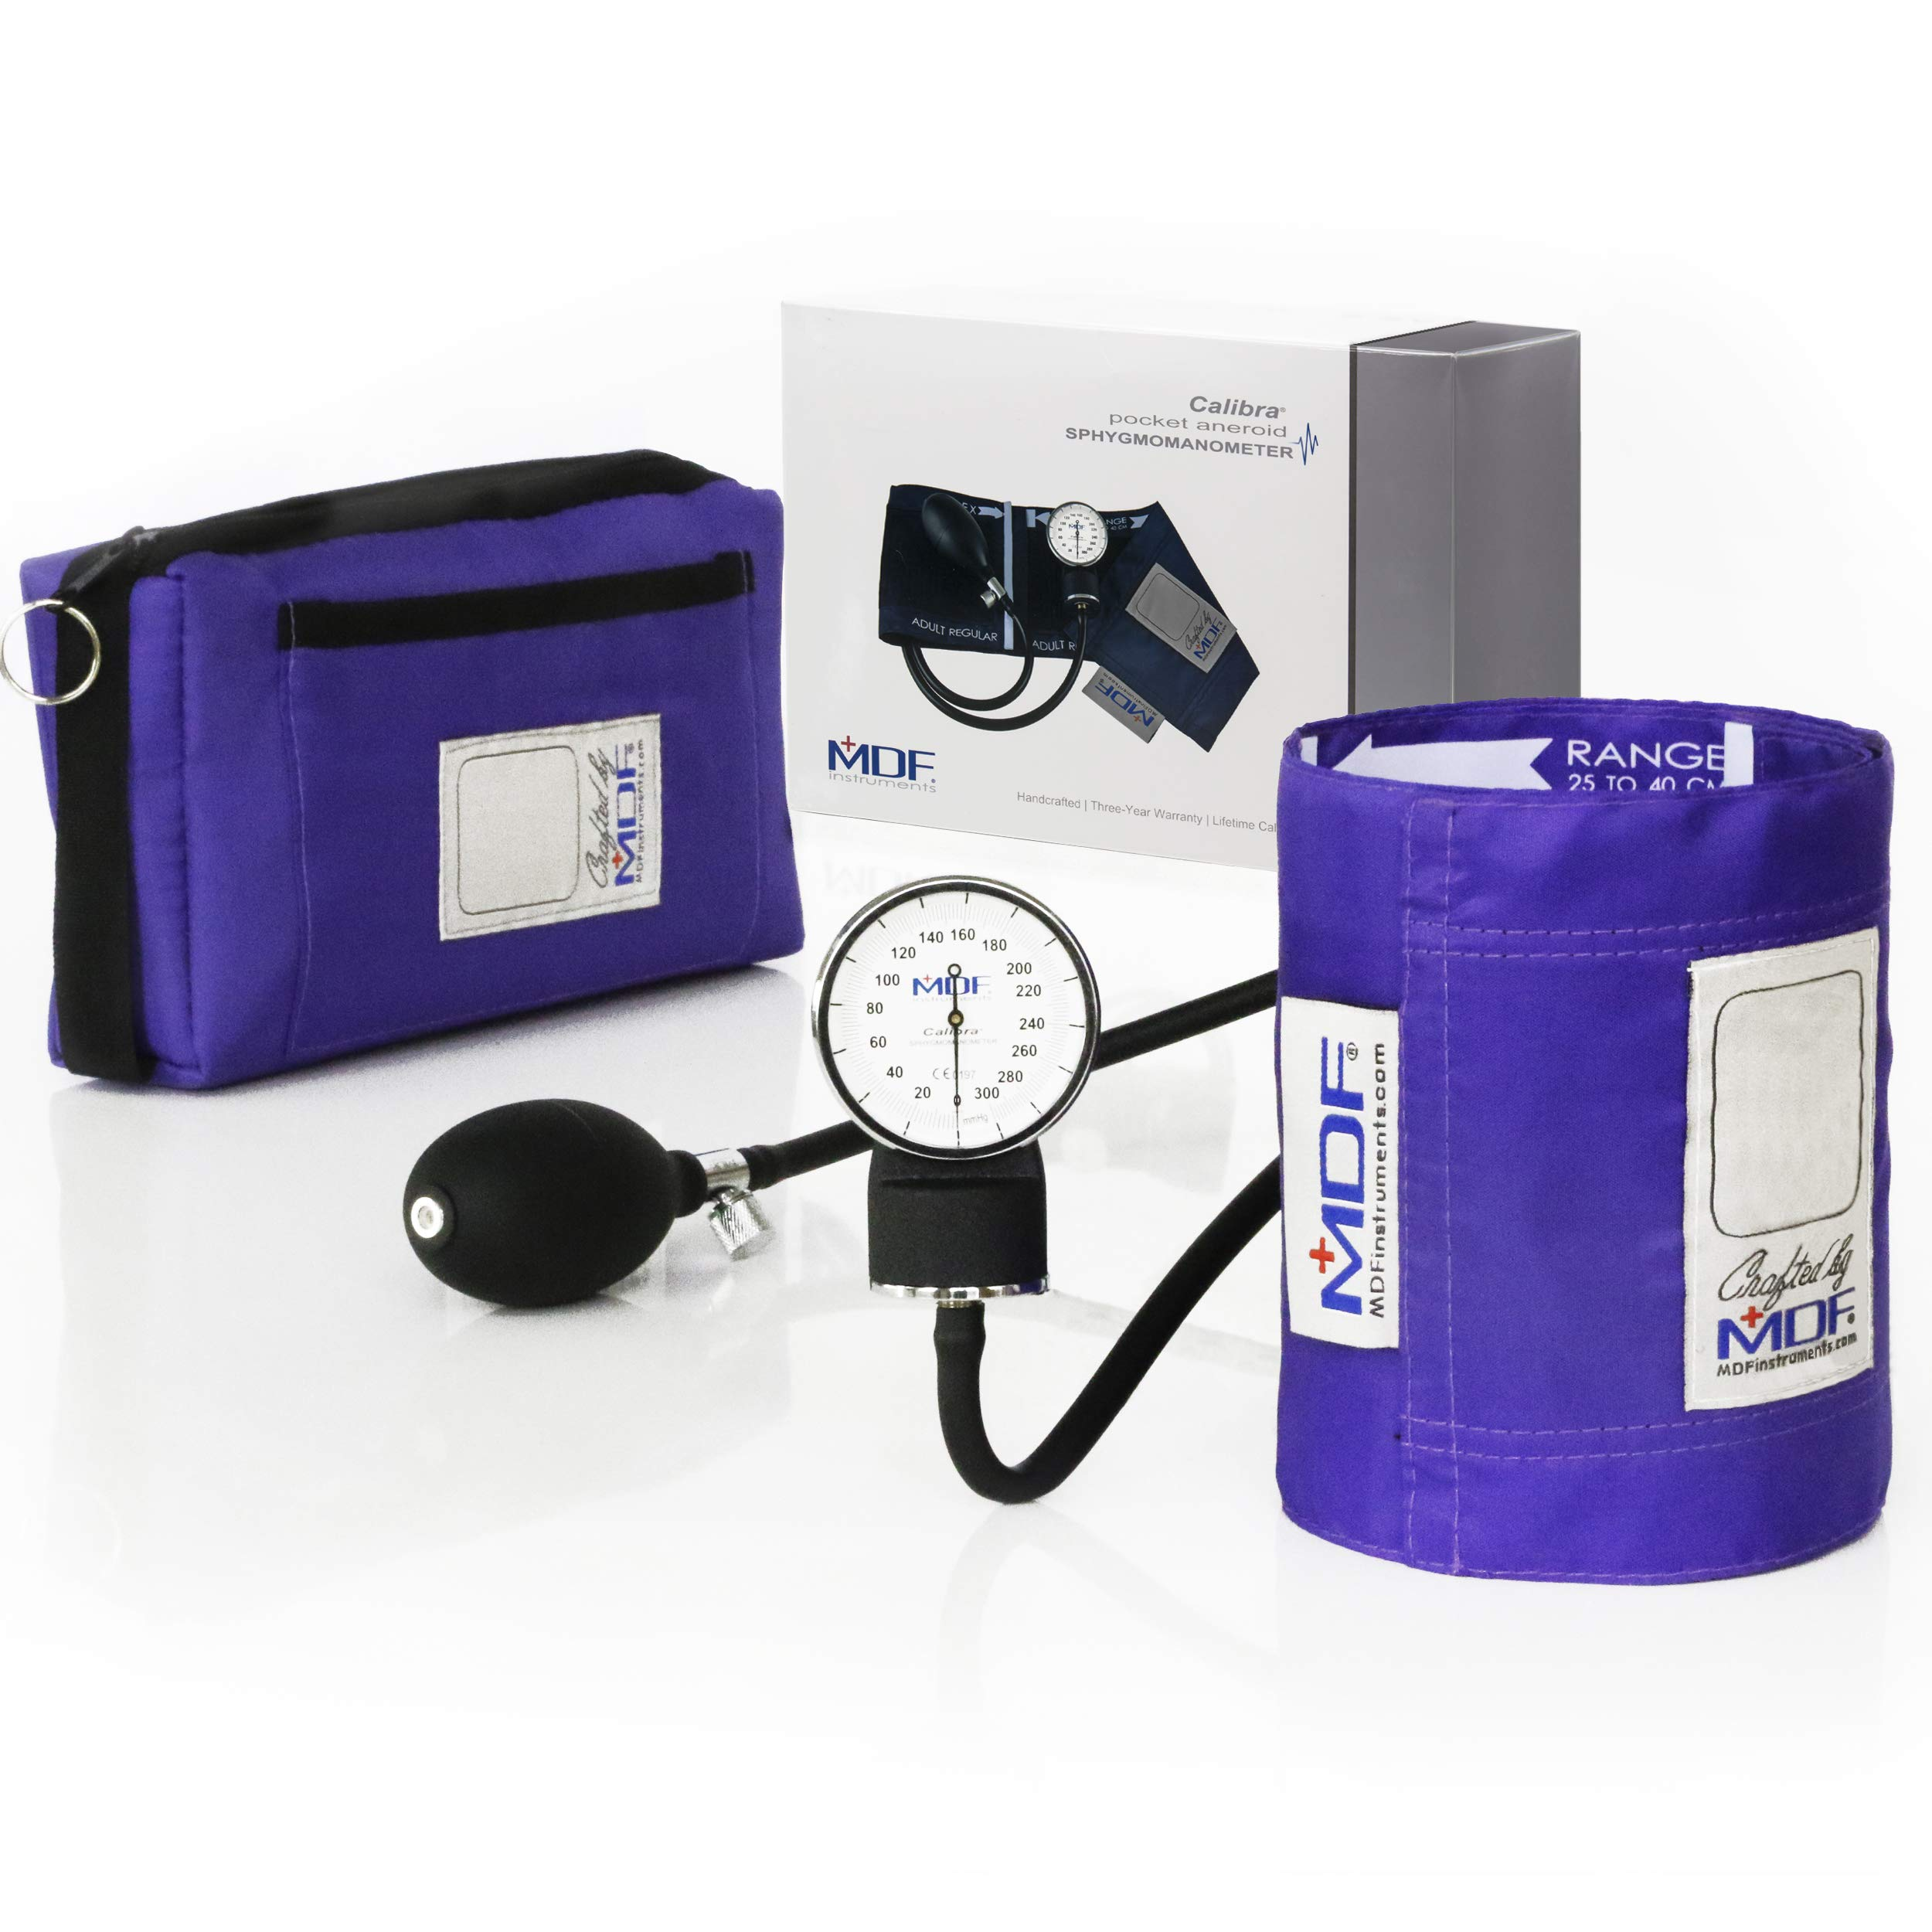 MDF Calibra Aneroid Premium Professional Sphygmomanometer, Blood Pressure Monitor with Adult Cuff & Carrying Case, Lifetime Calibration, White Dial, Purple Cuff, MDF808M08